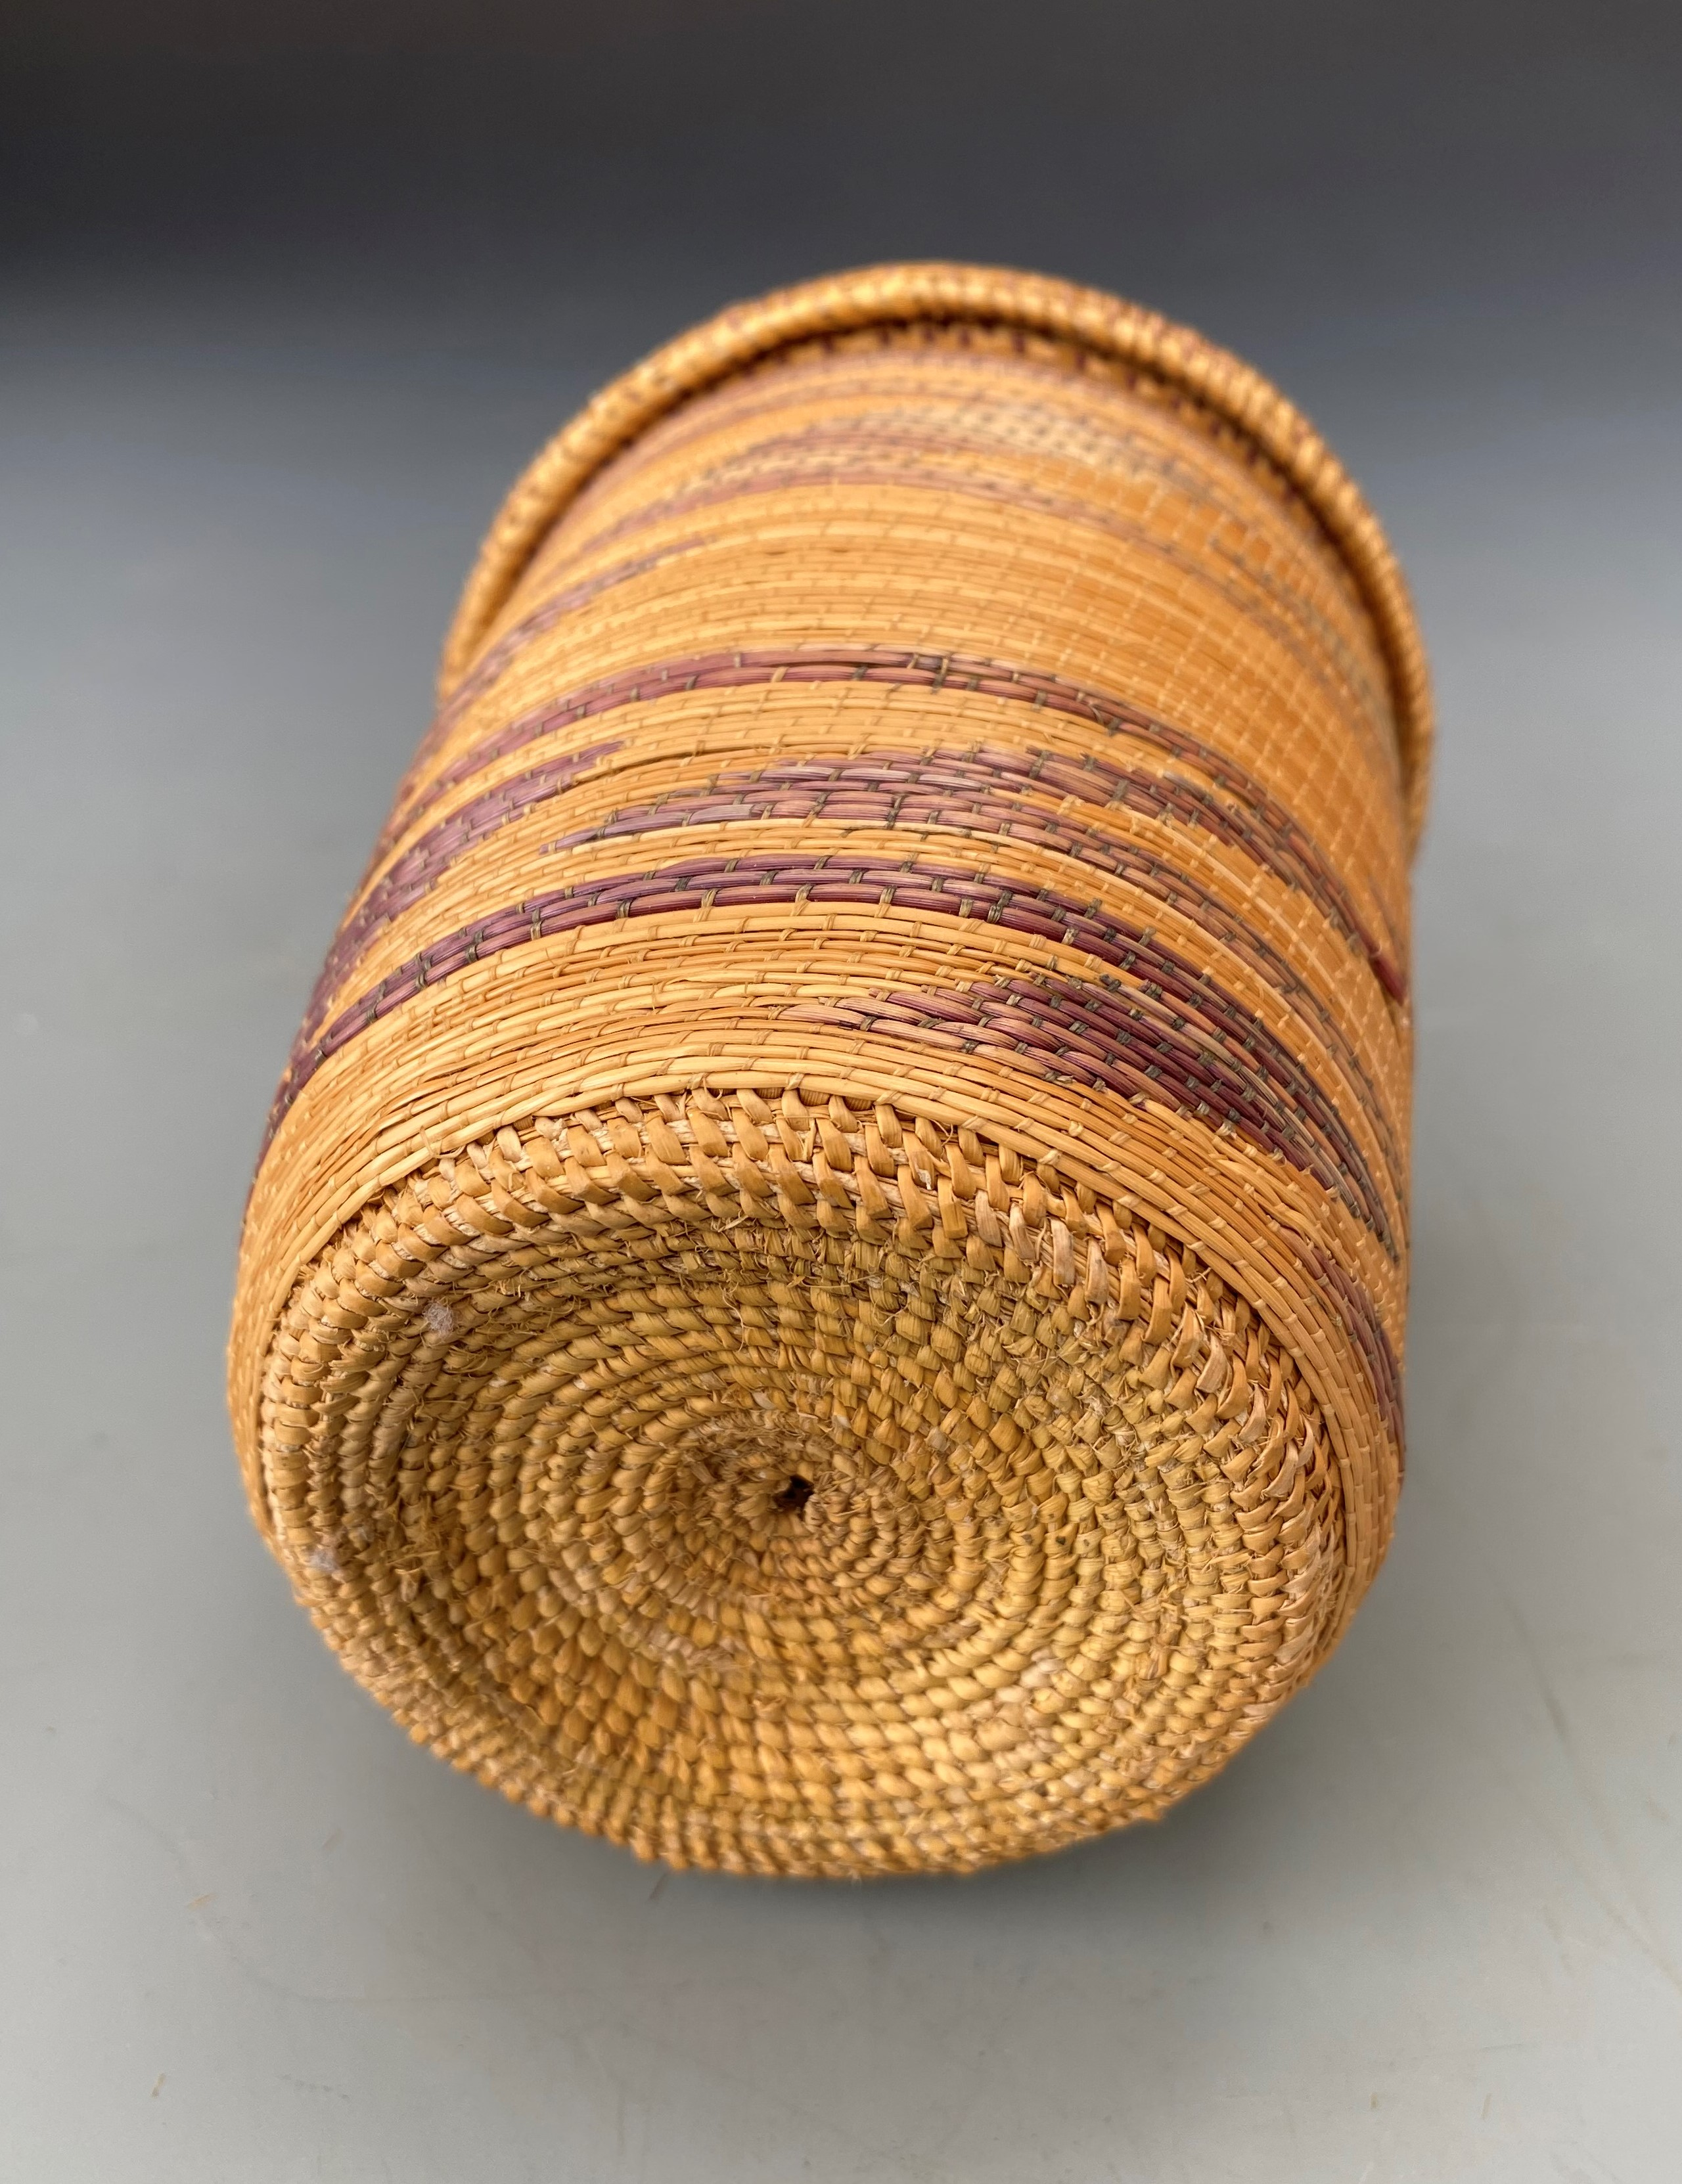 Two Fine Tutsi Agaseke Baskets one with Double - Layered